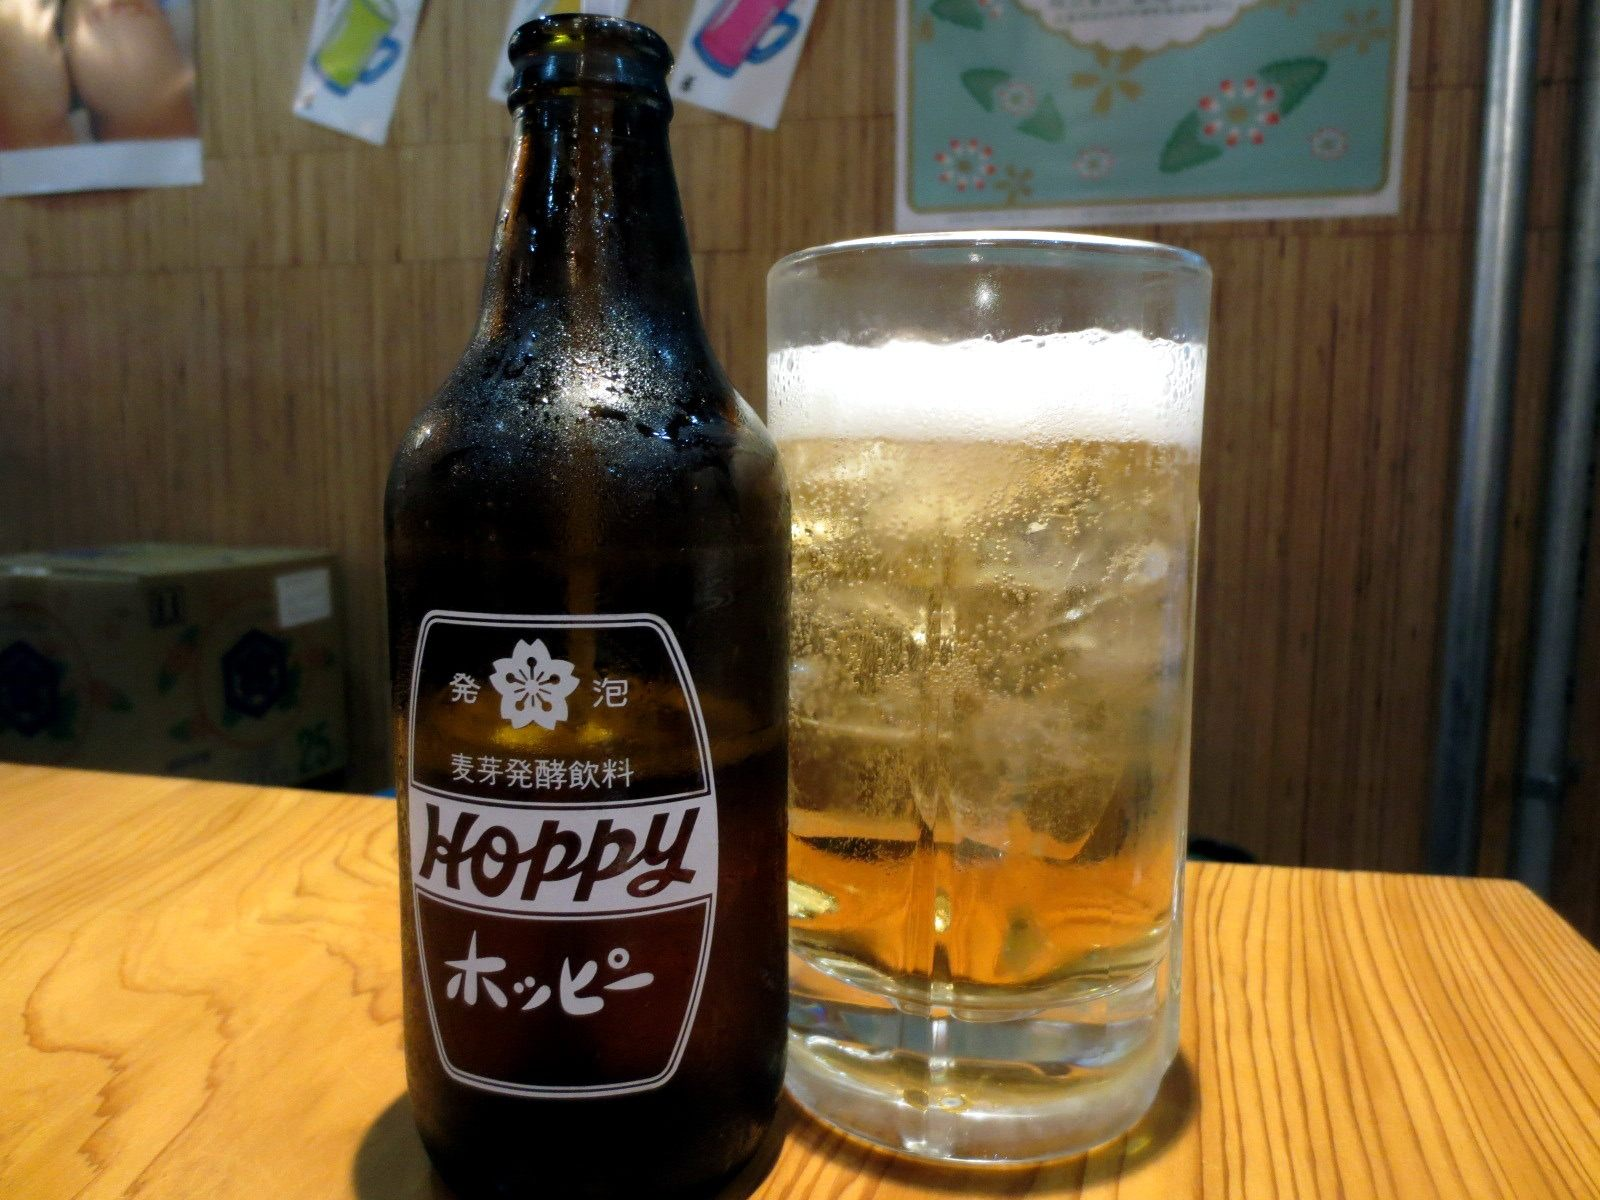 Hoppy – 400 yen